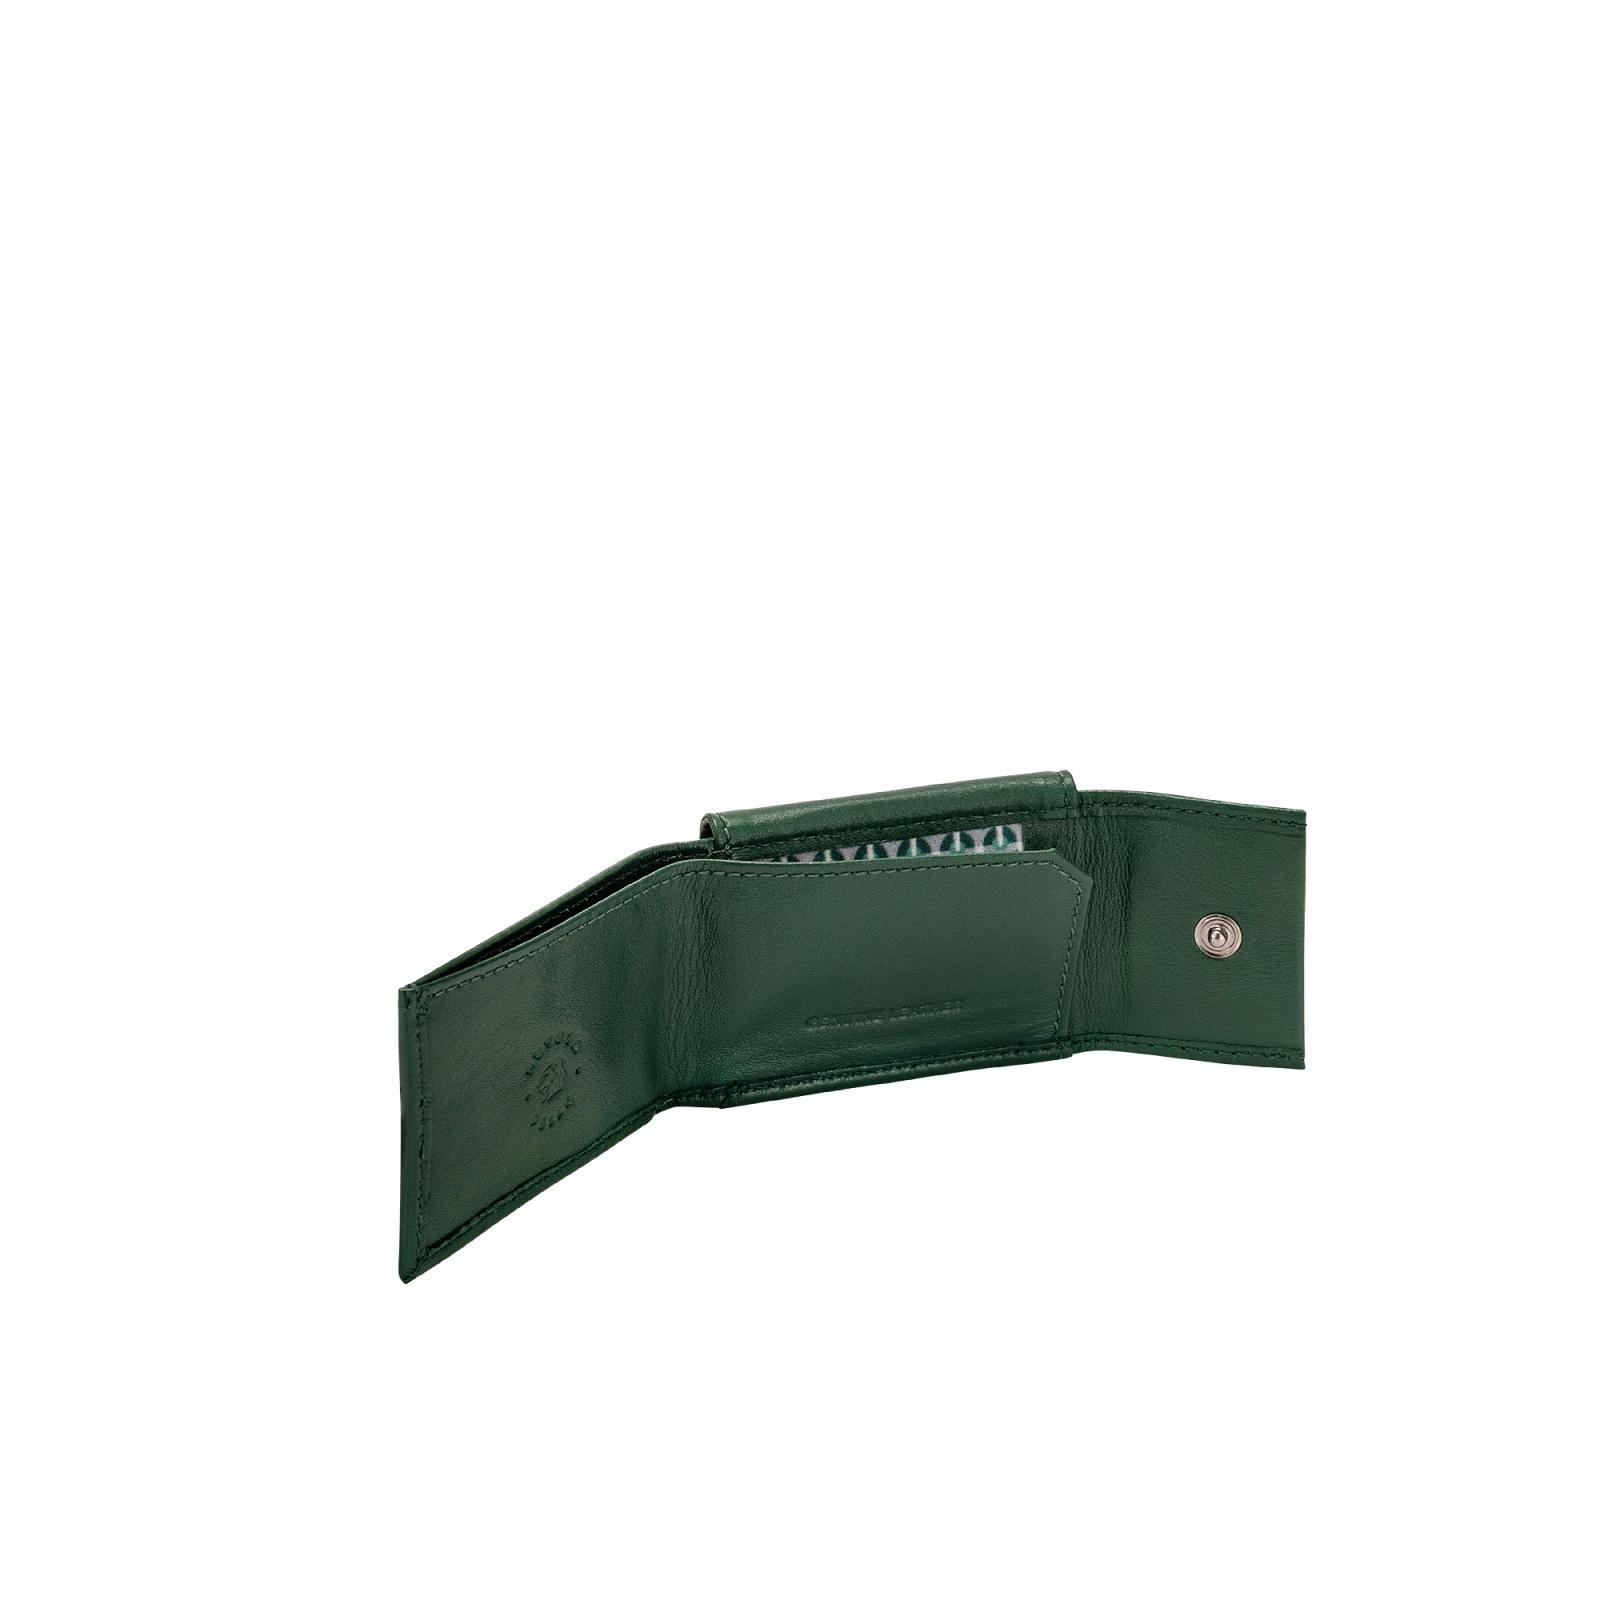 Portafogli  Uomo  Nappa - Buddy  - Verde